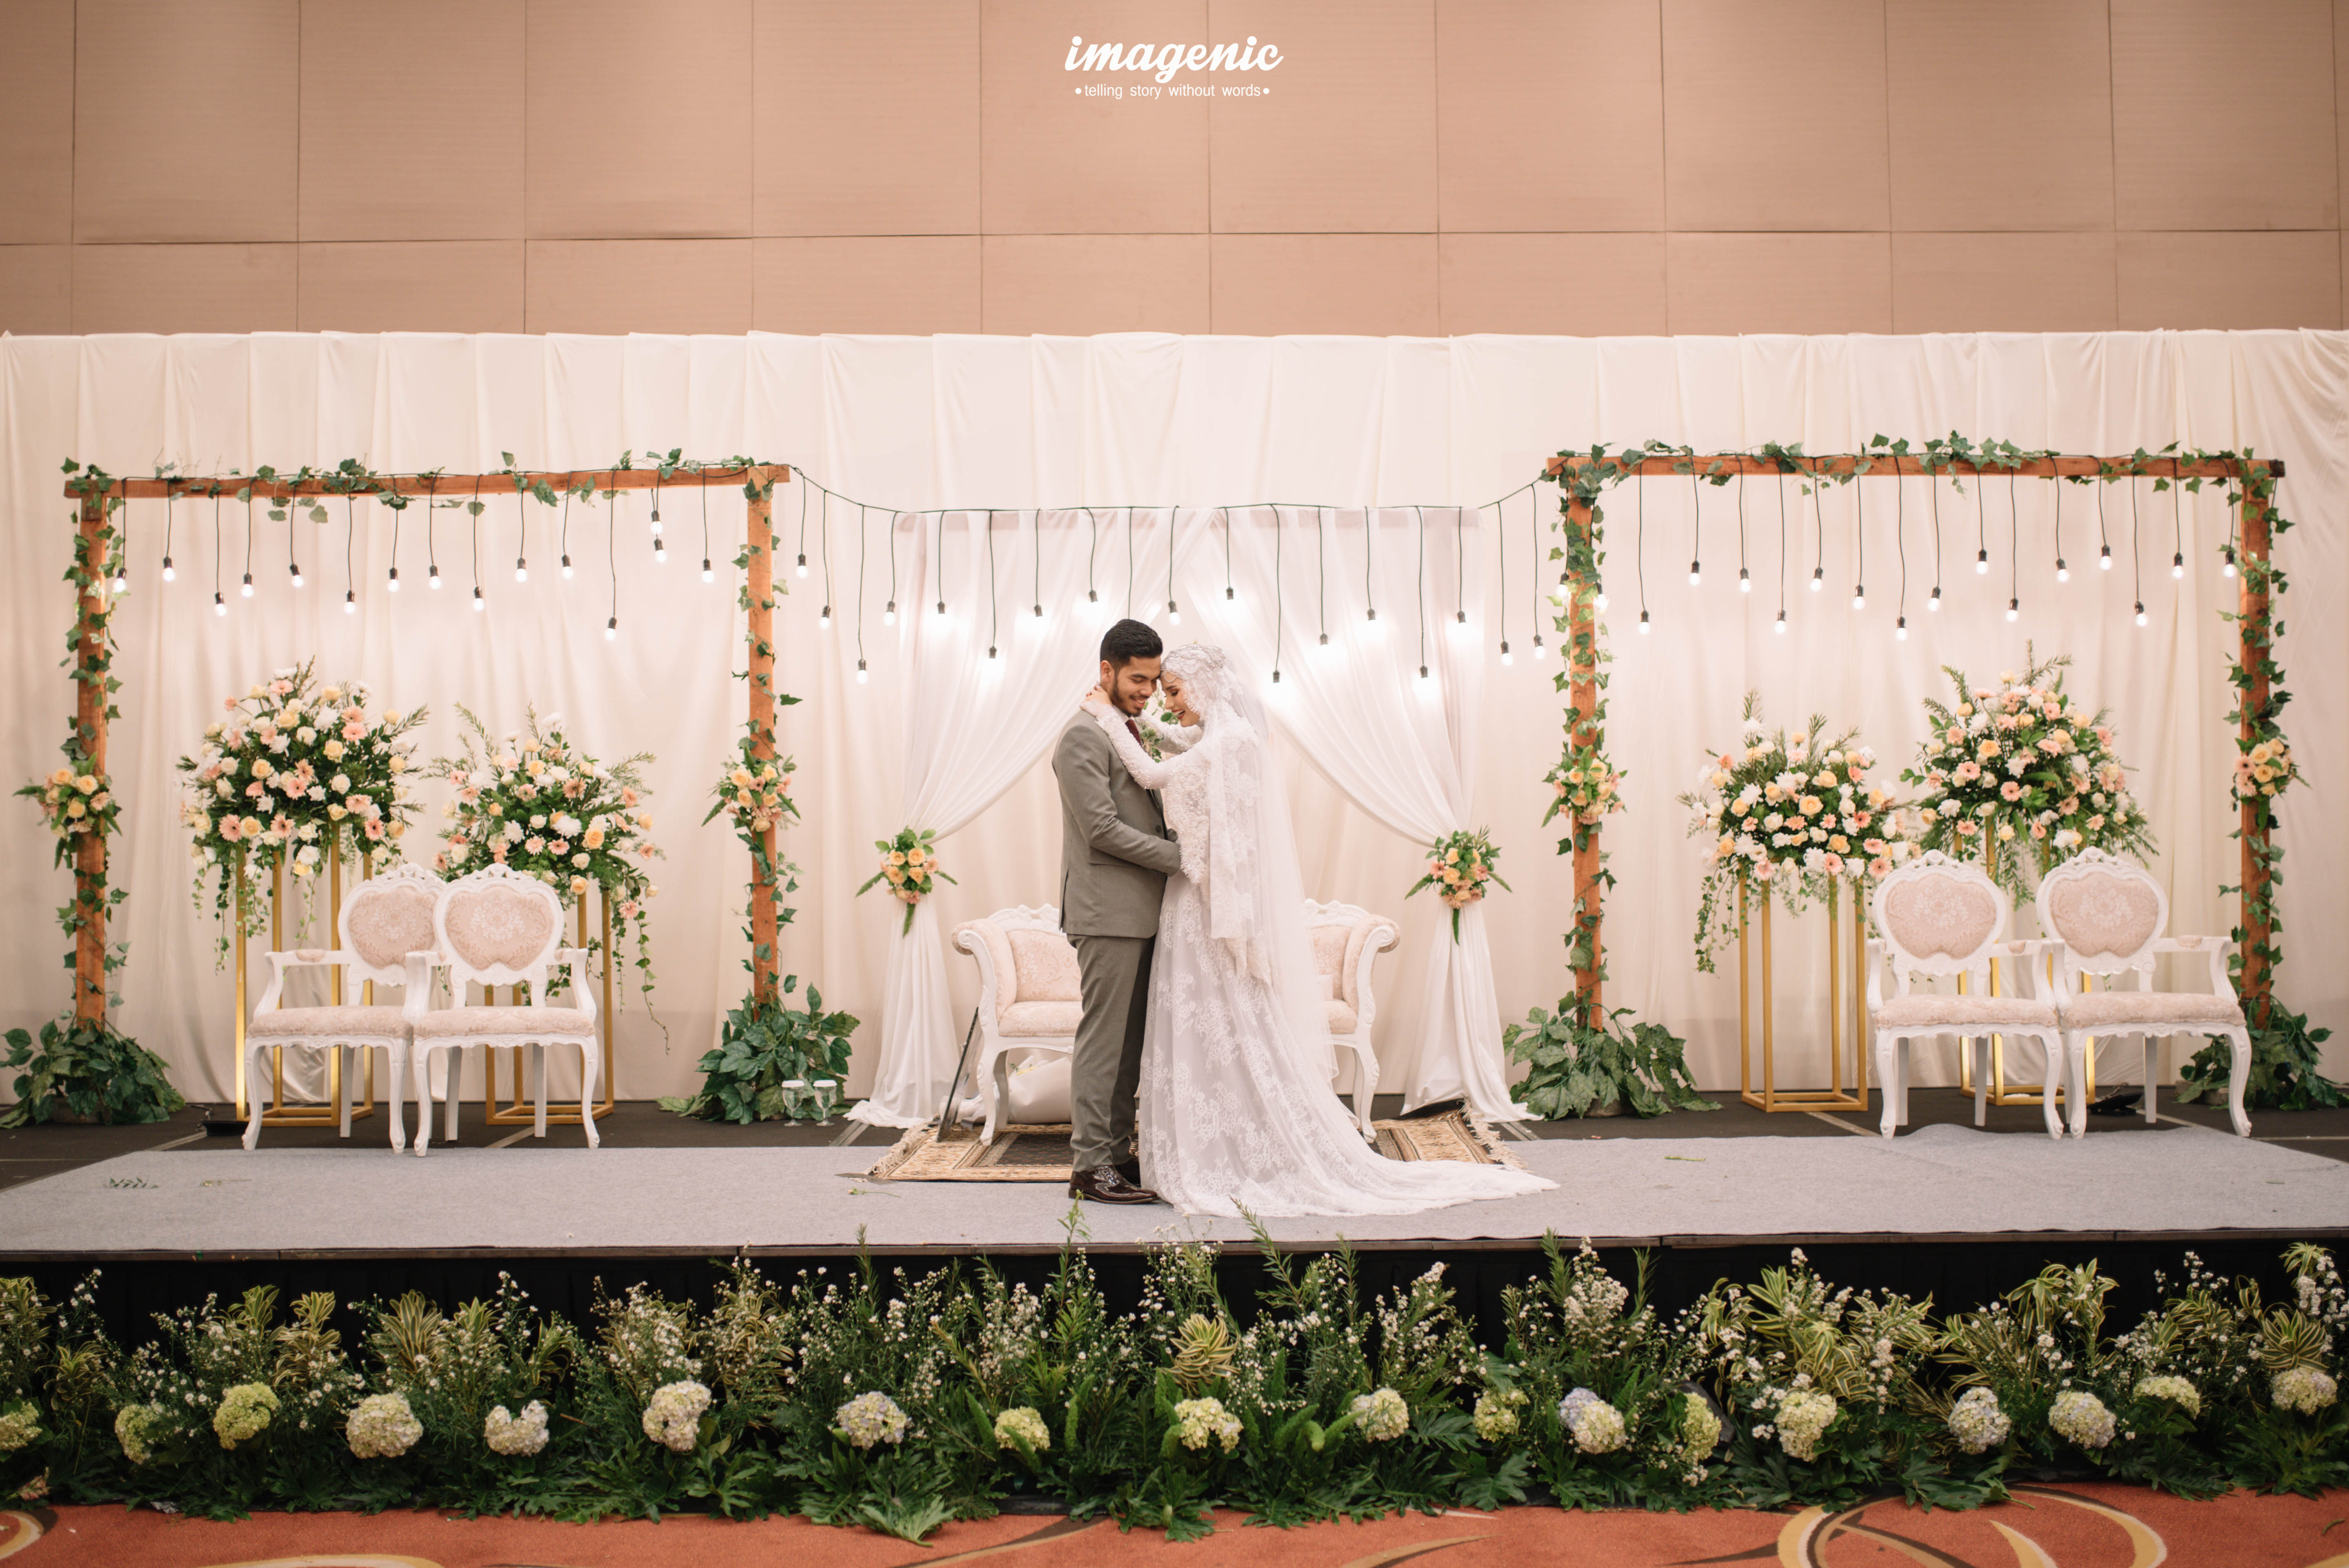 Imagenic wedding photography in bogor bridestory junglespirit Images